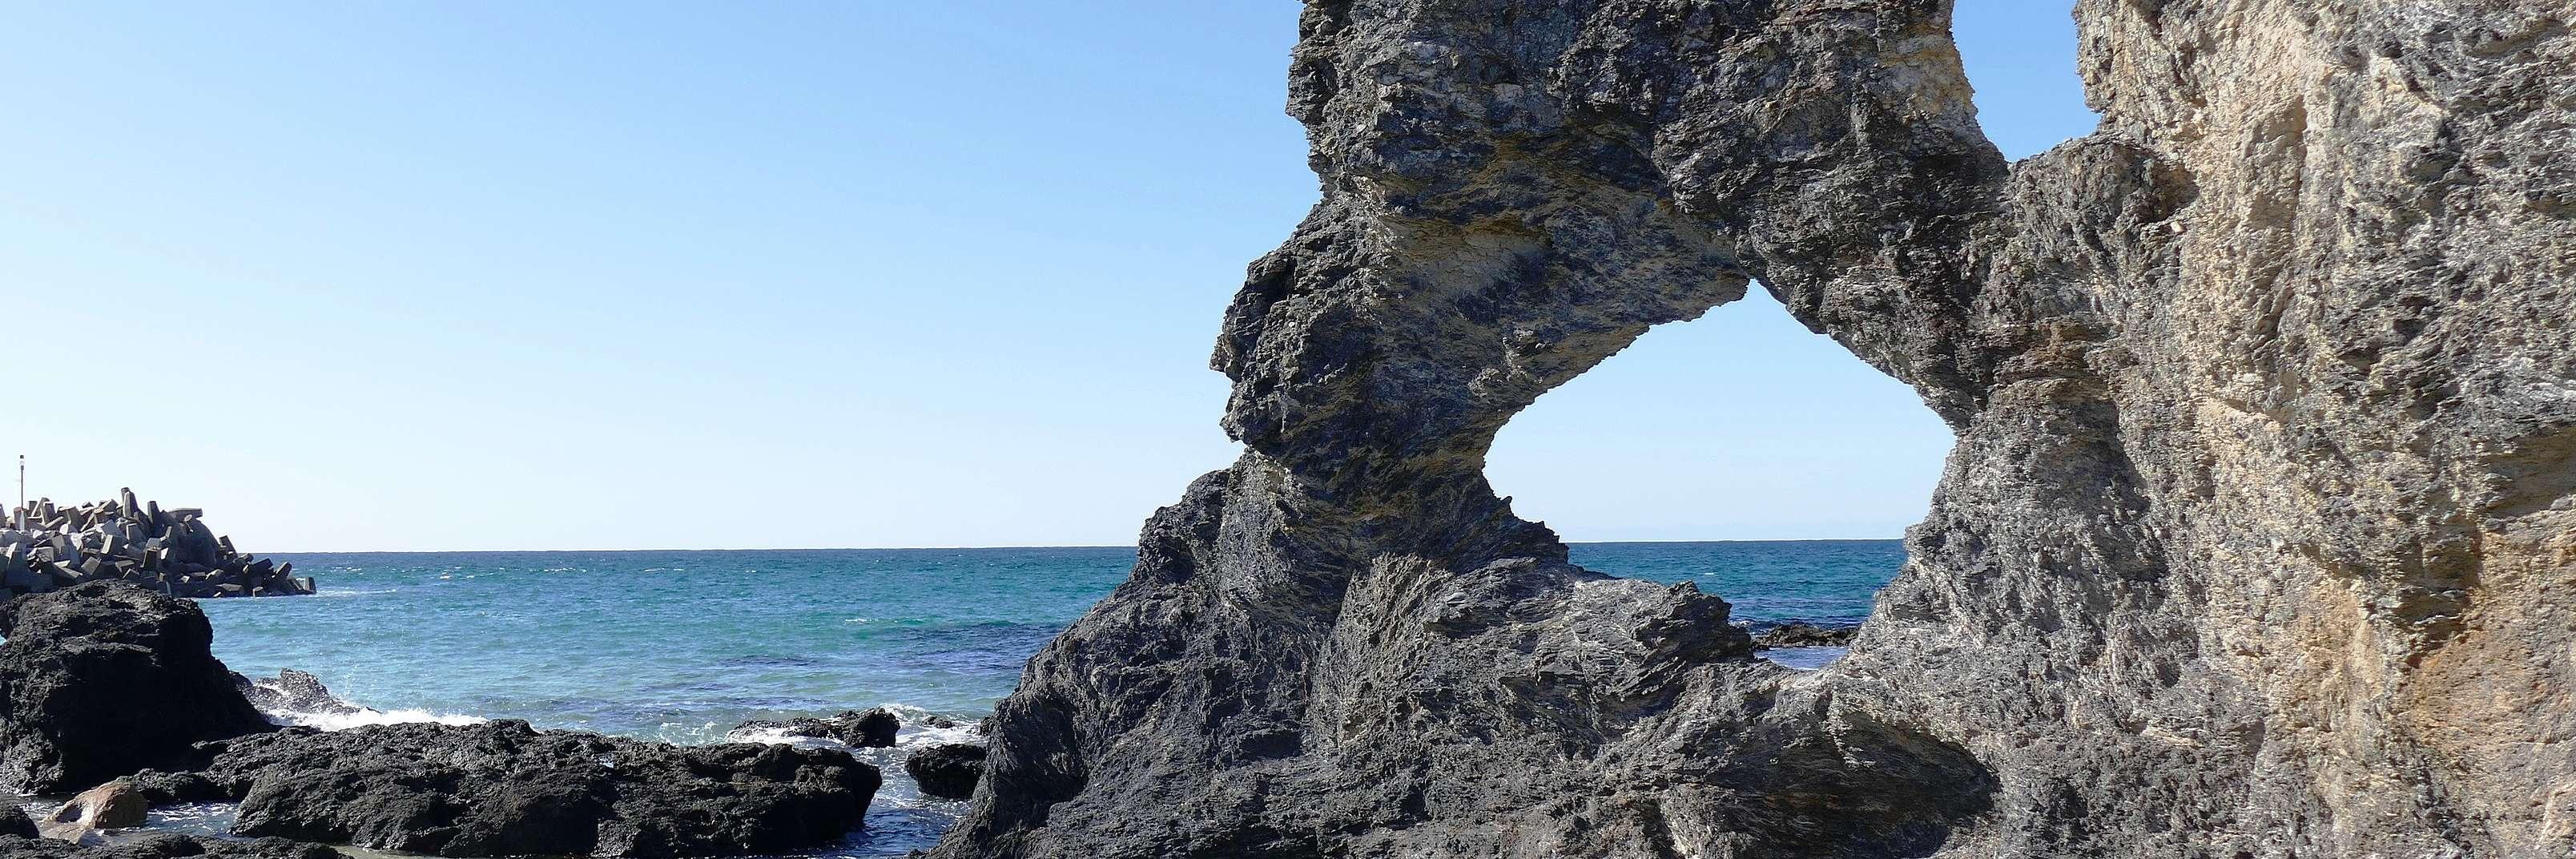 Australia Rock @ Narooma